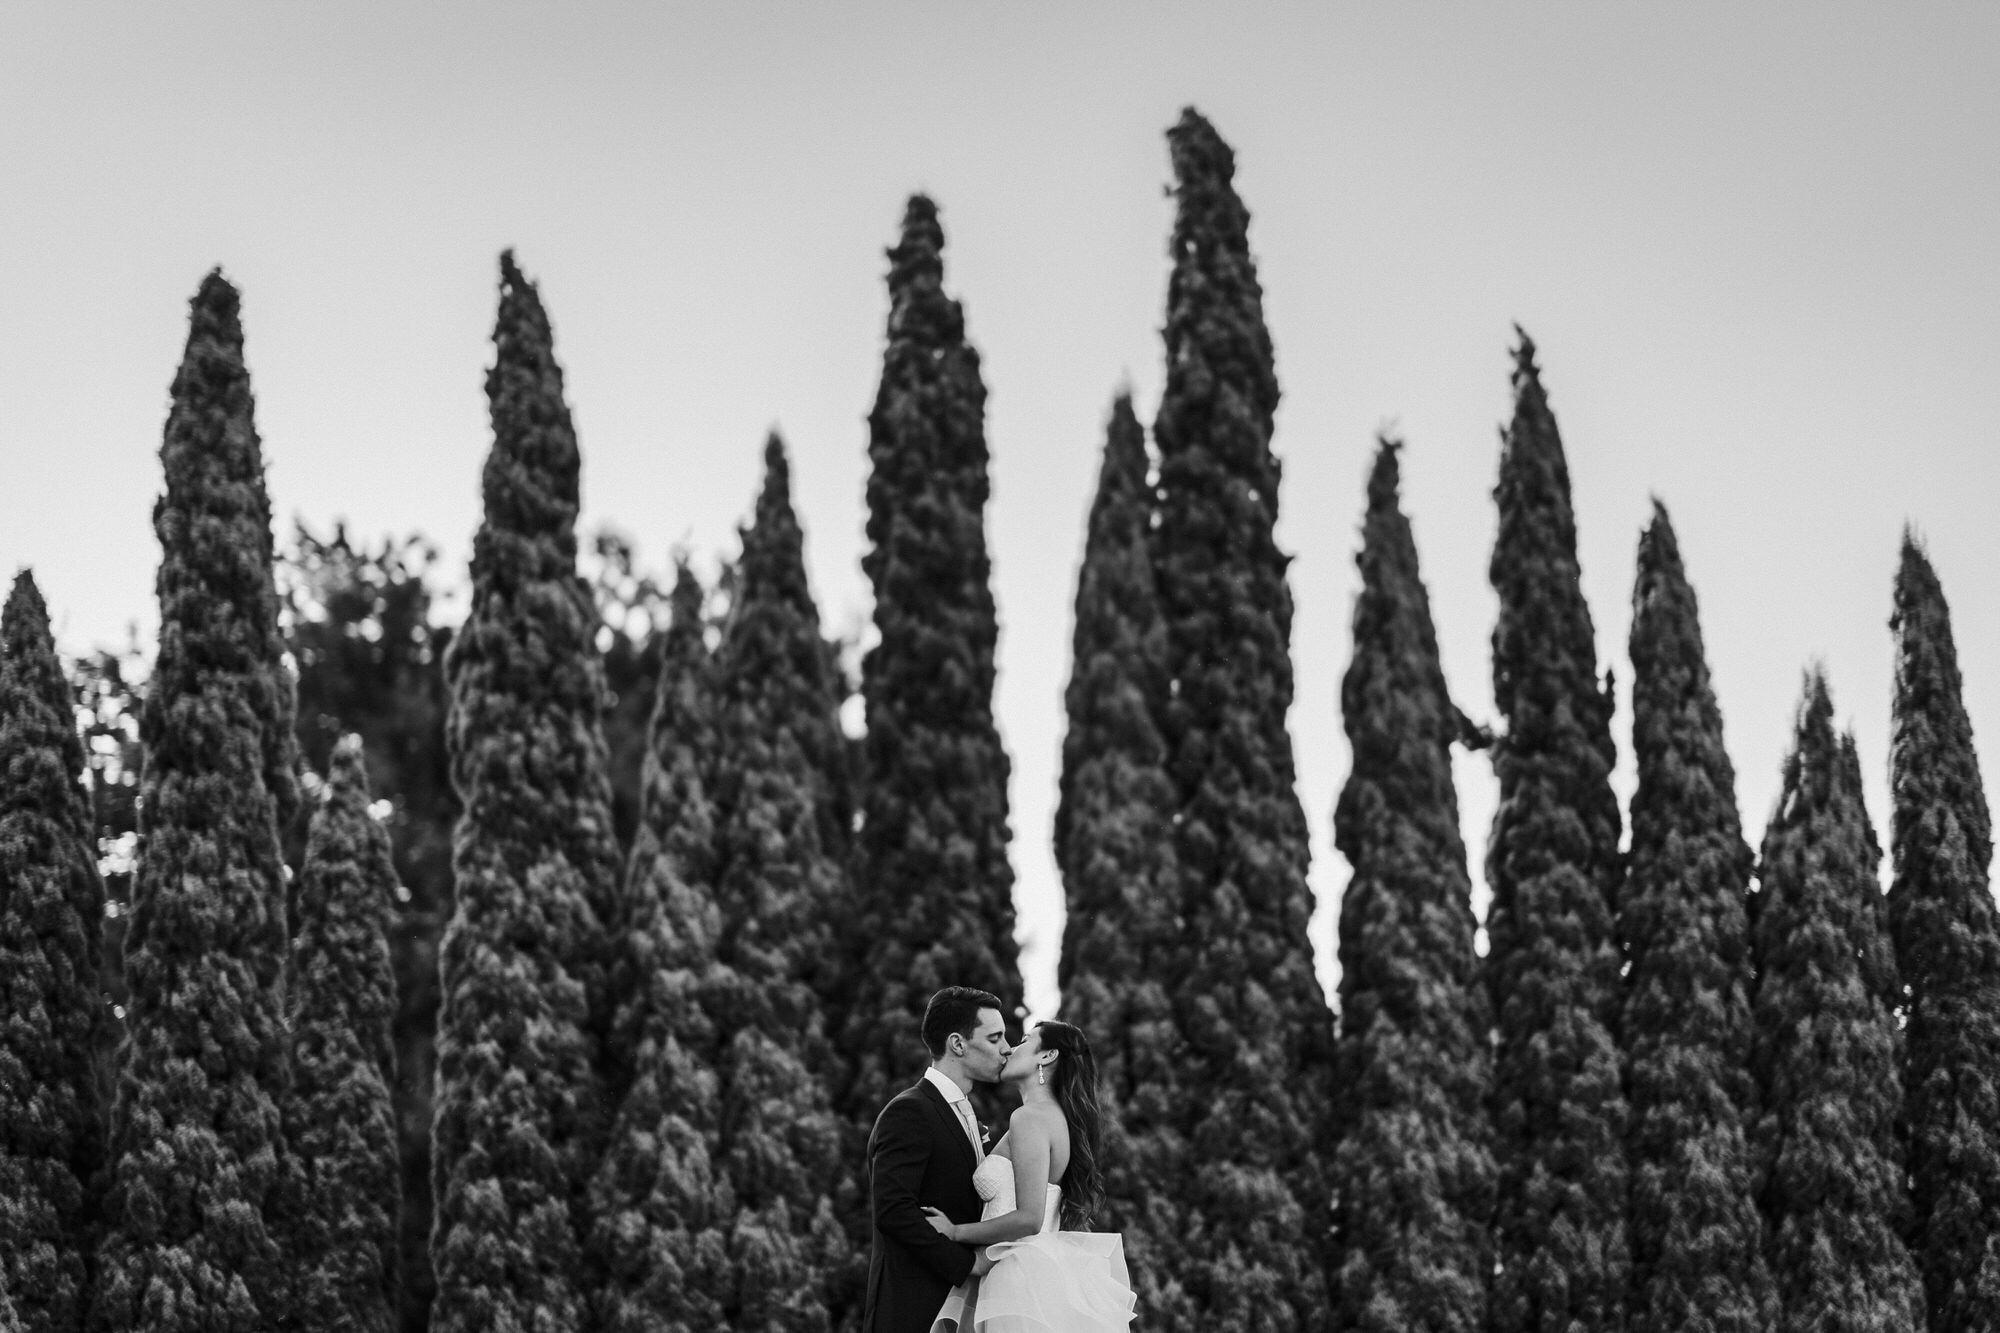 Corey Wright Stones Yarra Valley Wedding Photography_025.jpg